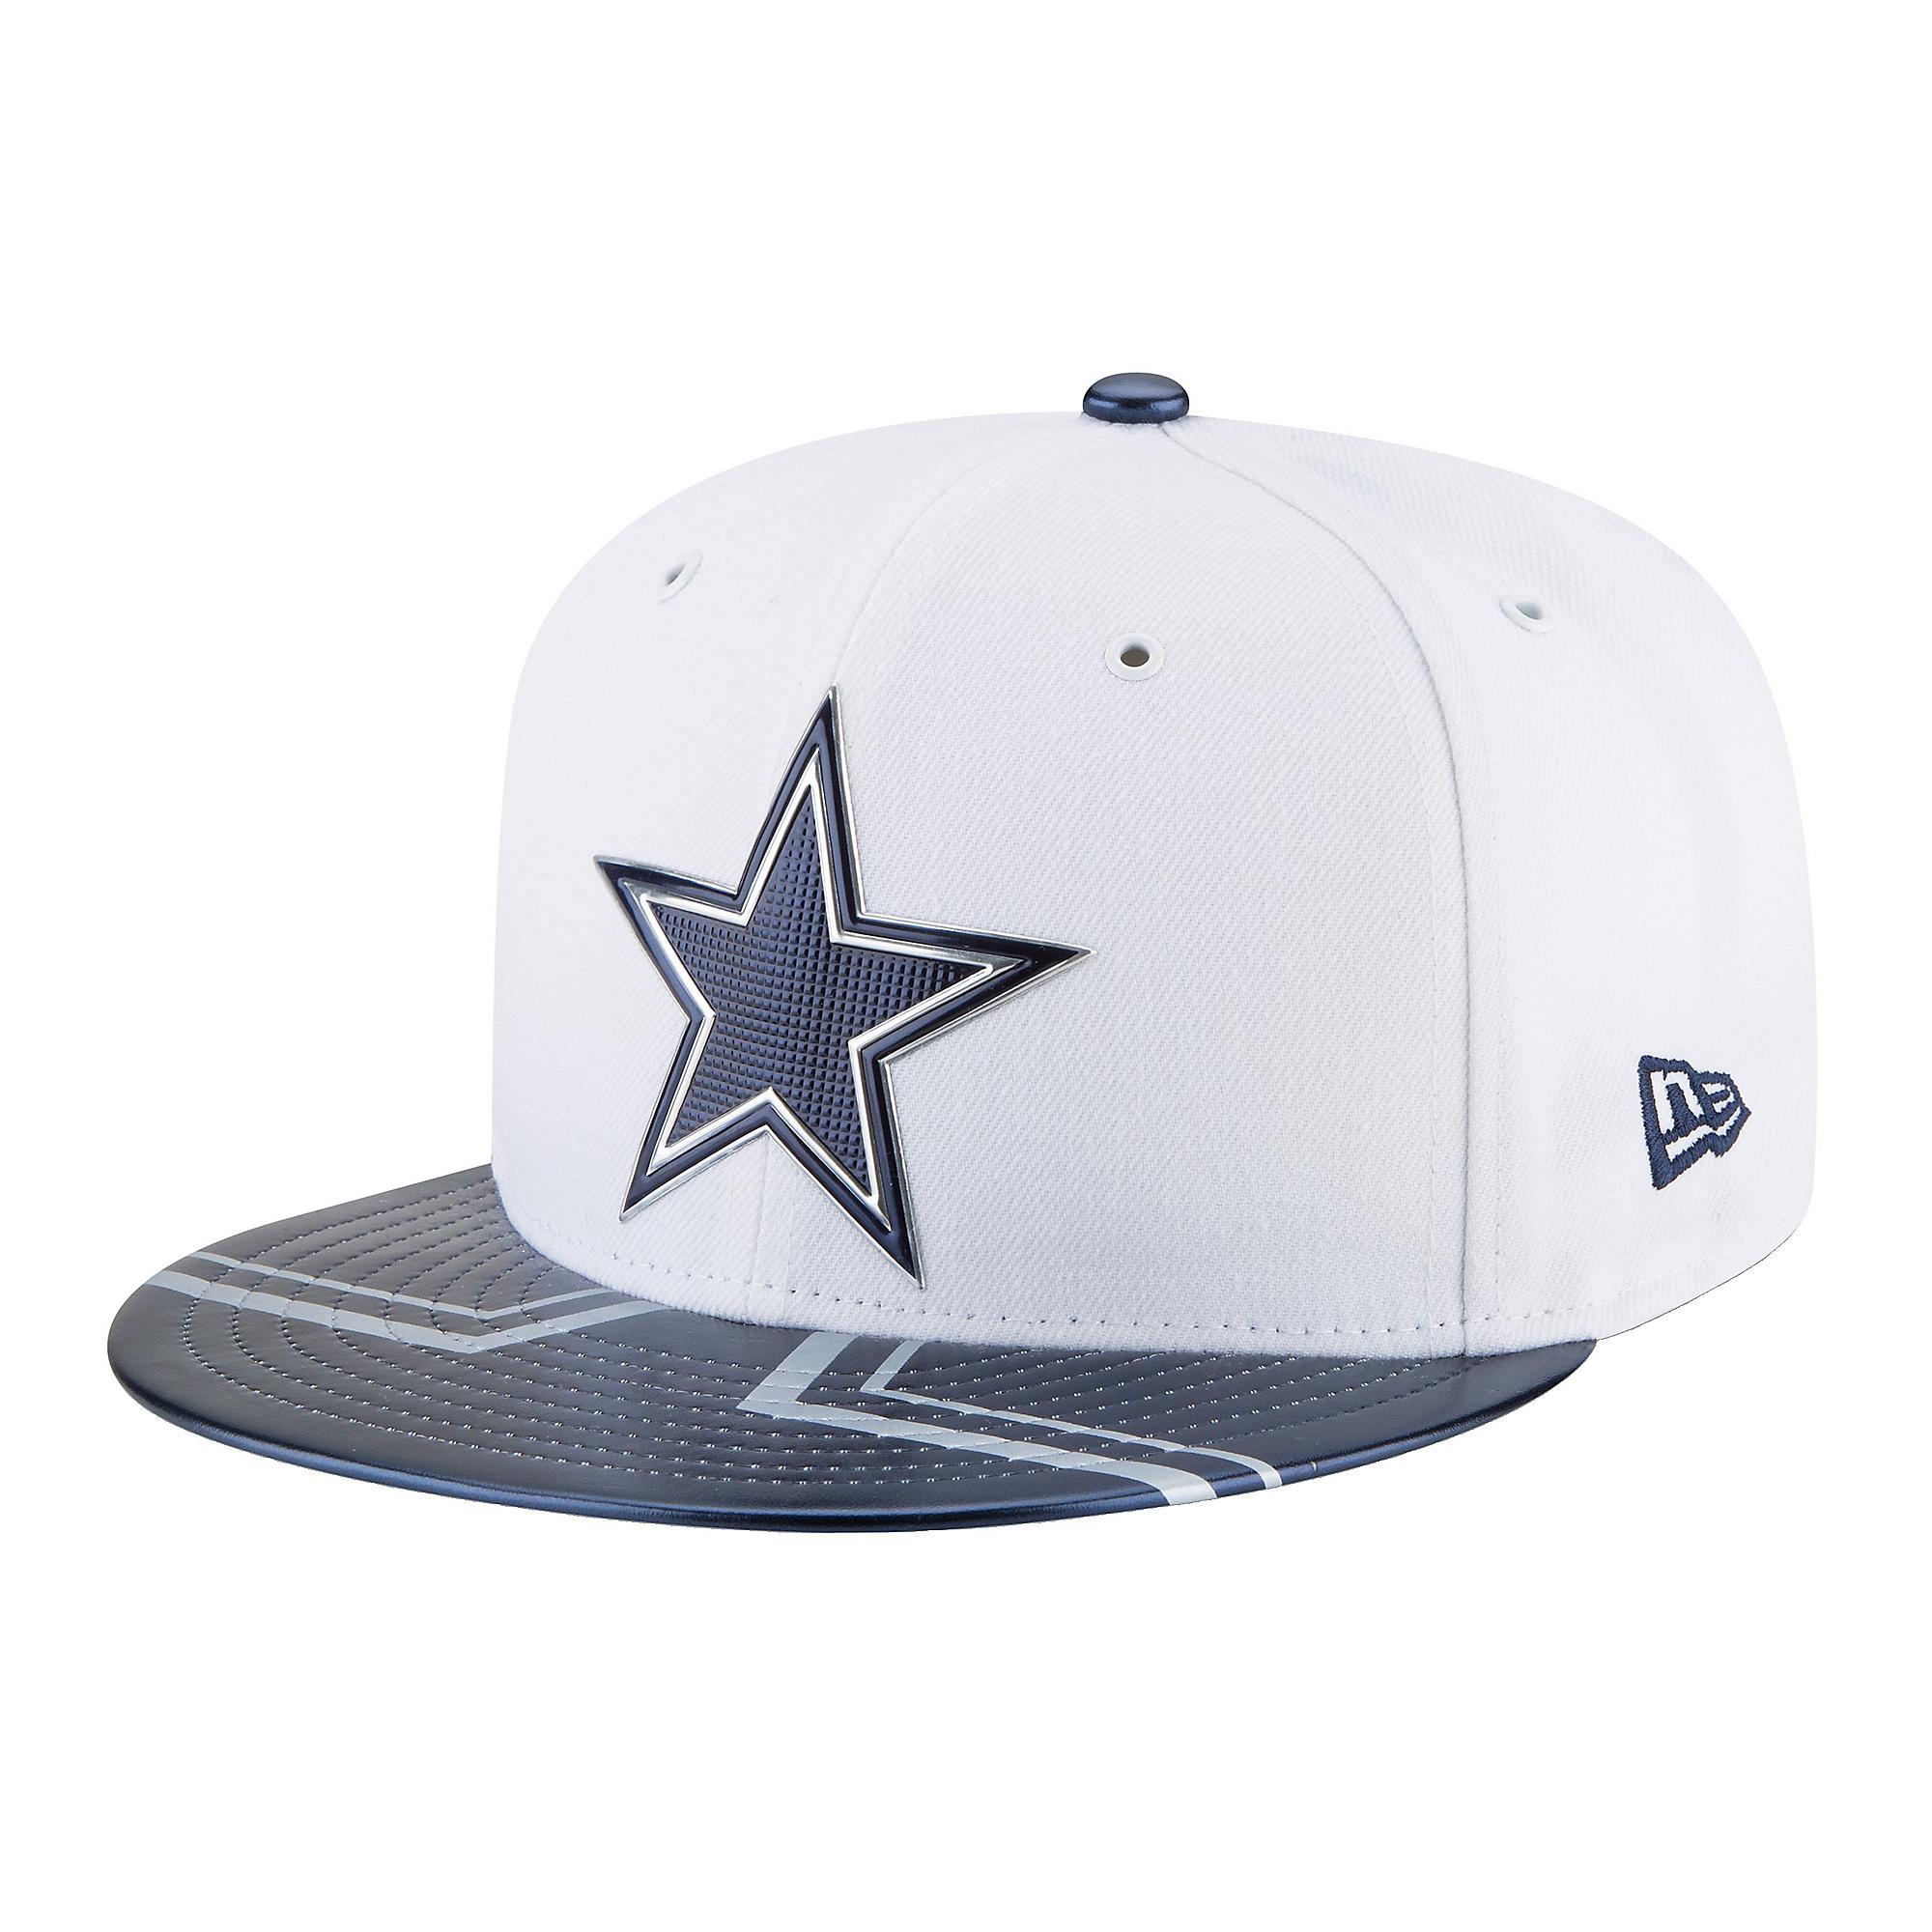 cheap for discount 0361d 0848f ... ireland dallas cowboys new era 2017 draft mens onstage 59fifty cap  a5787 fe09a